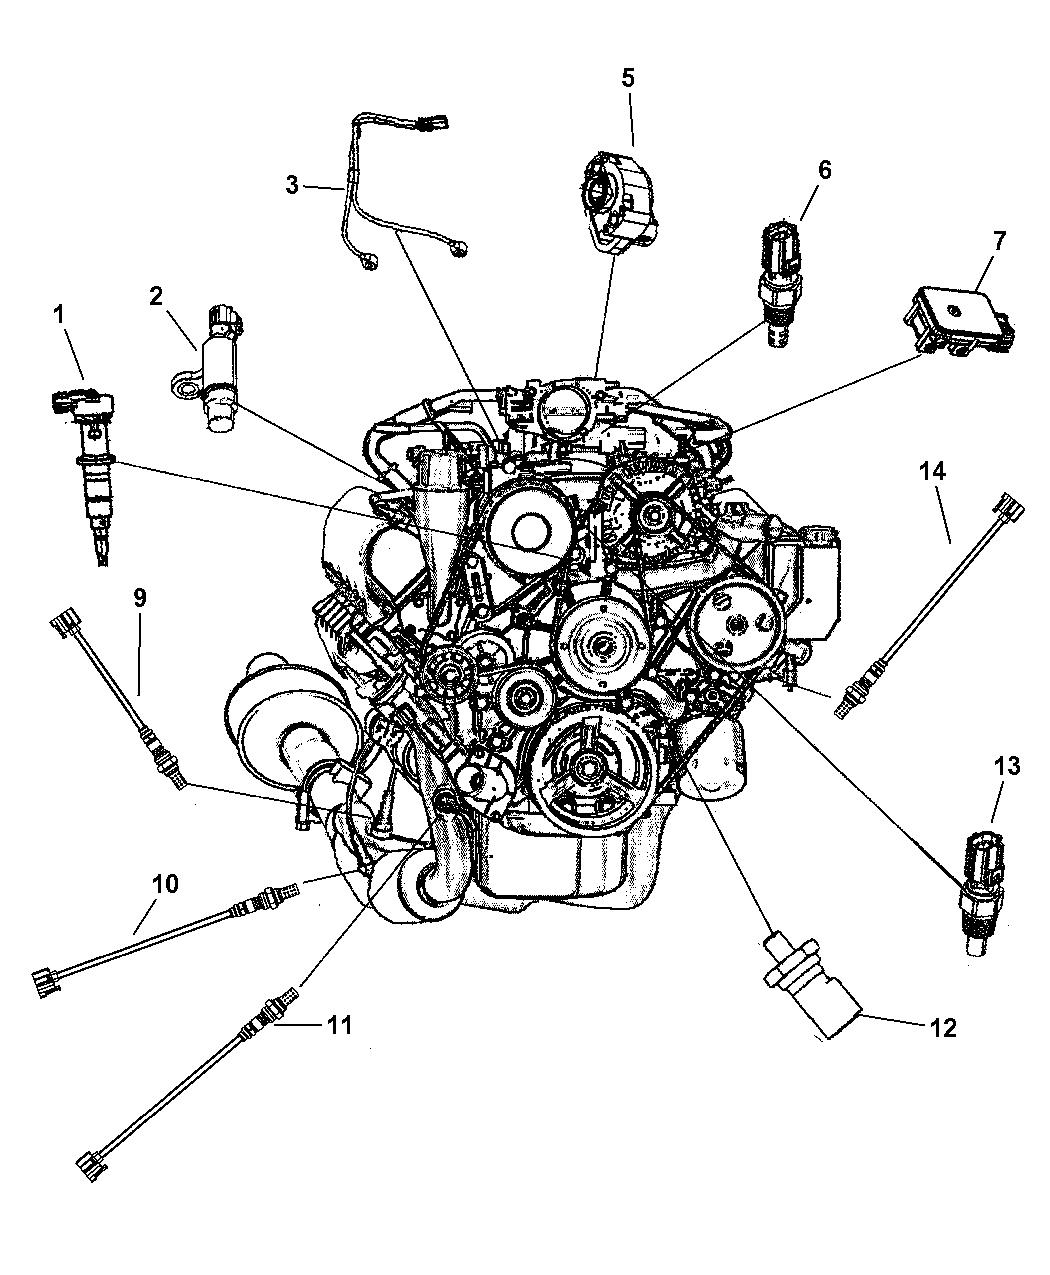 2003 Jeep Grand Cherokee Sensors - Engine